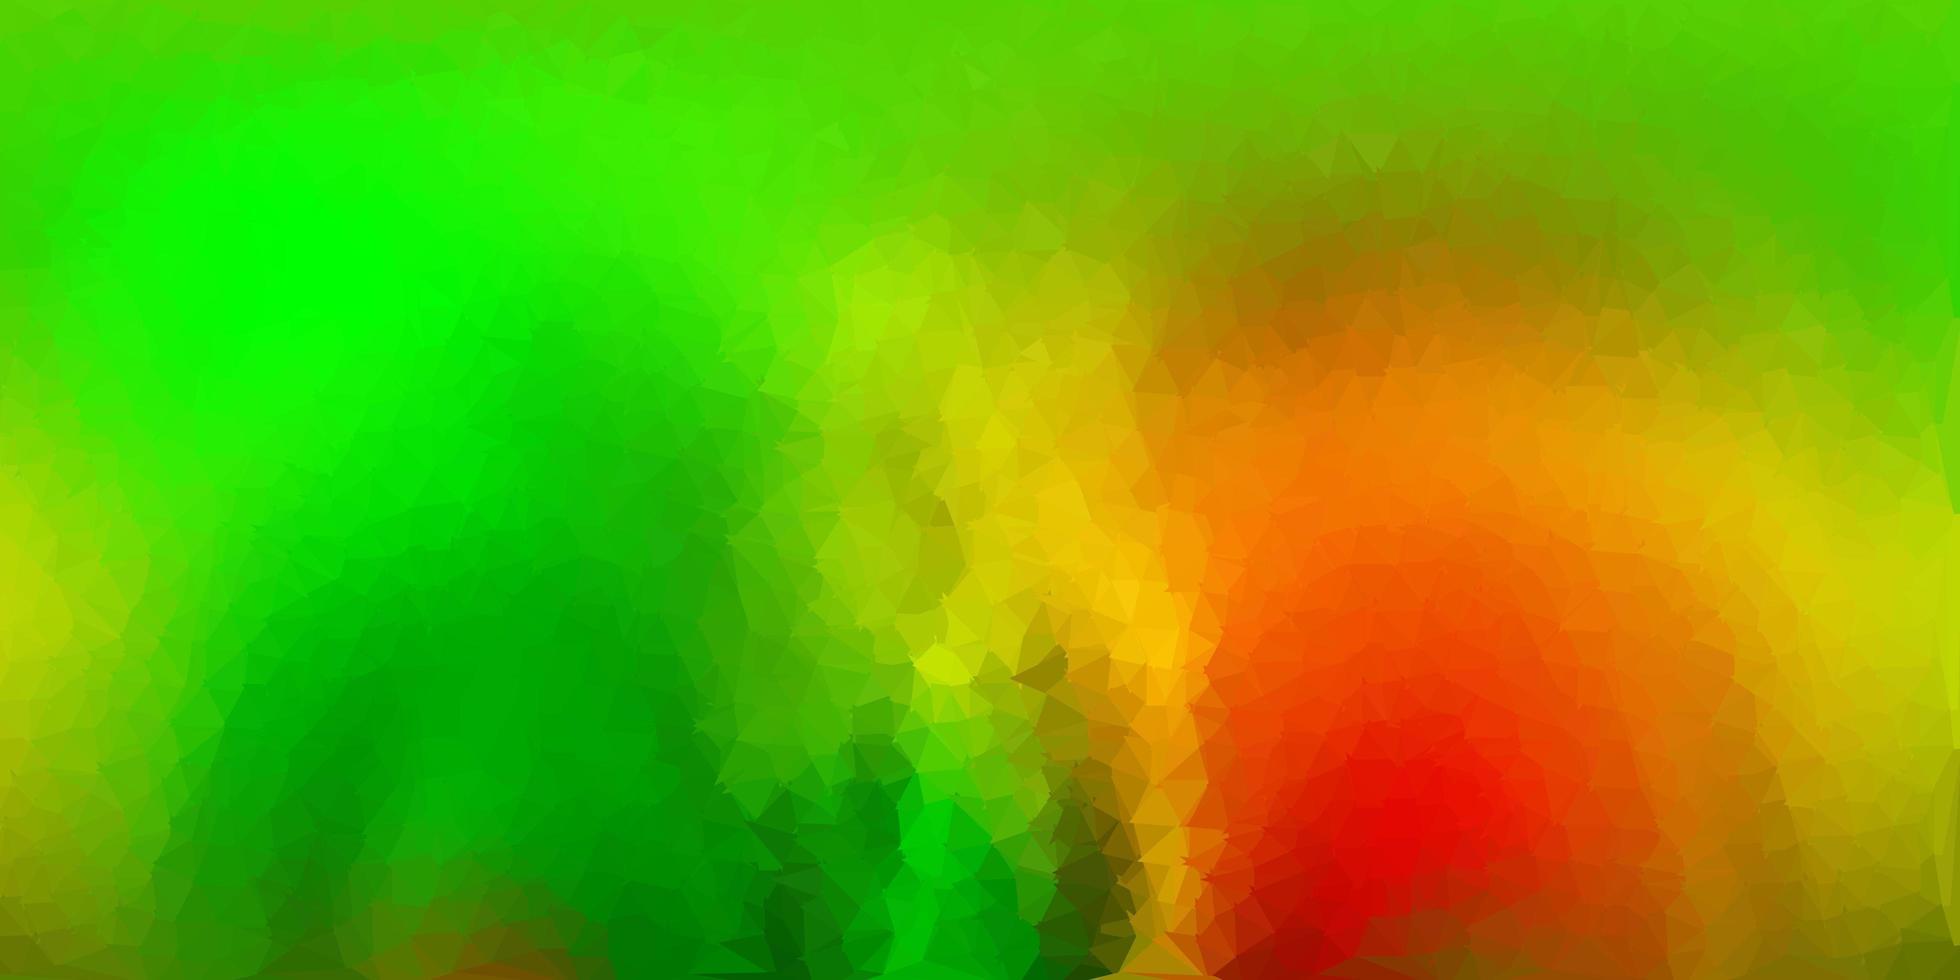 diseño de polígono degradado vectorial verde oscuro, amarillo. vector